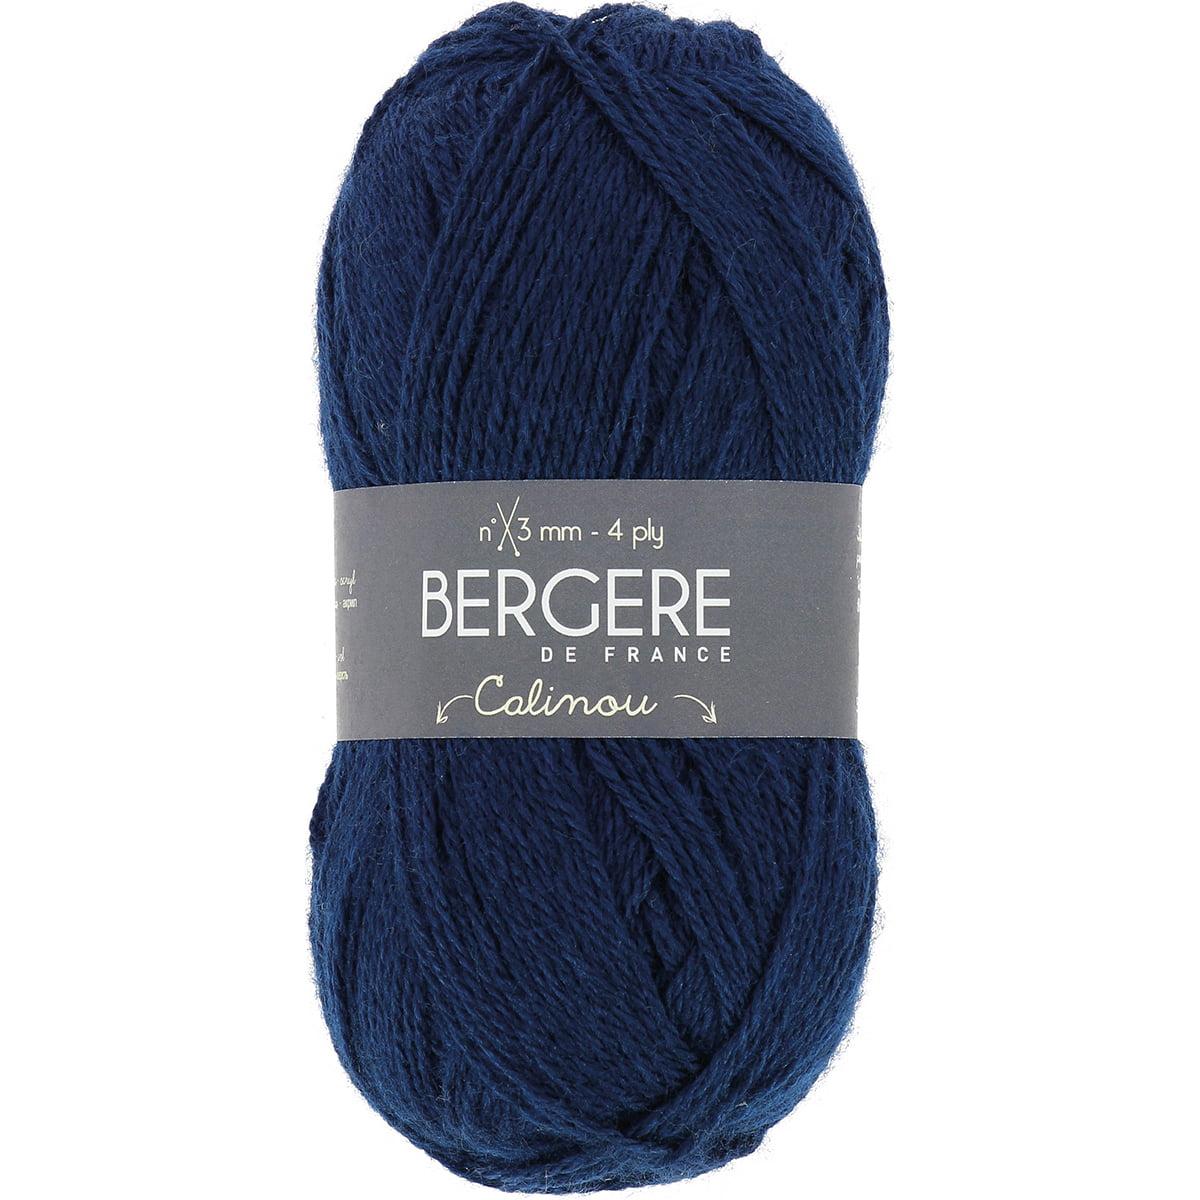 Bergere De France Calinou Yarn-Bleu Nuit